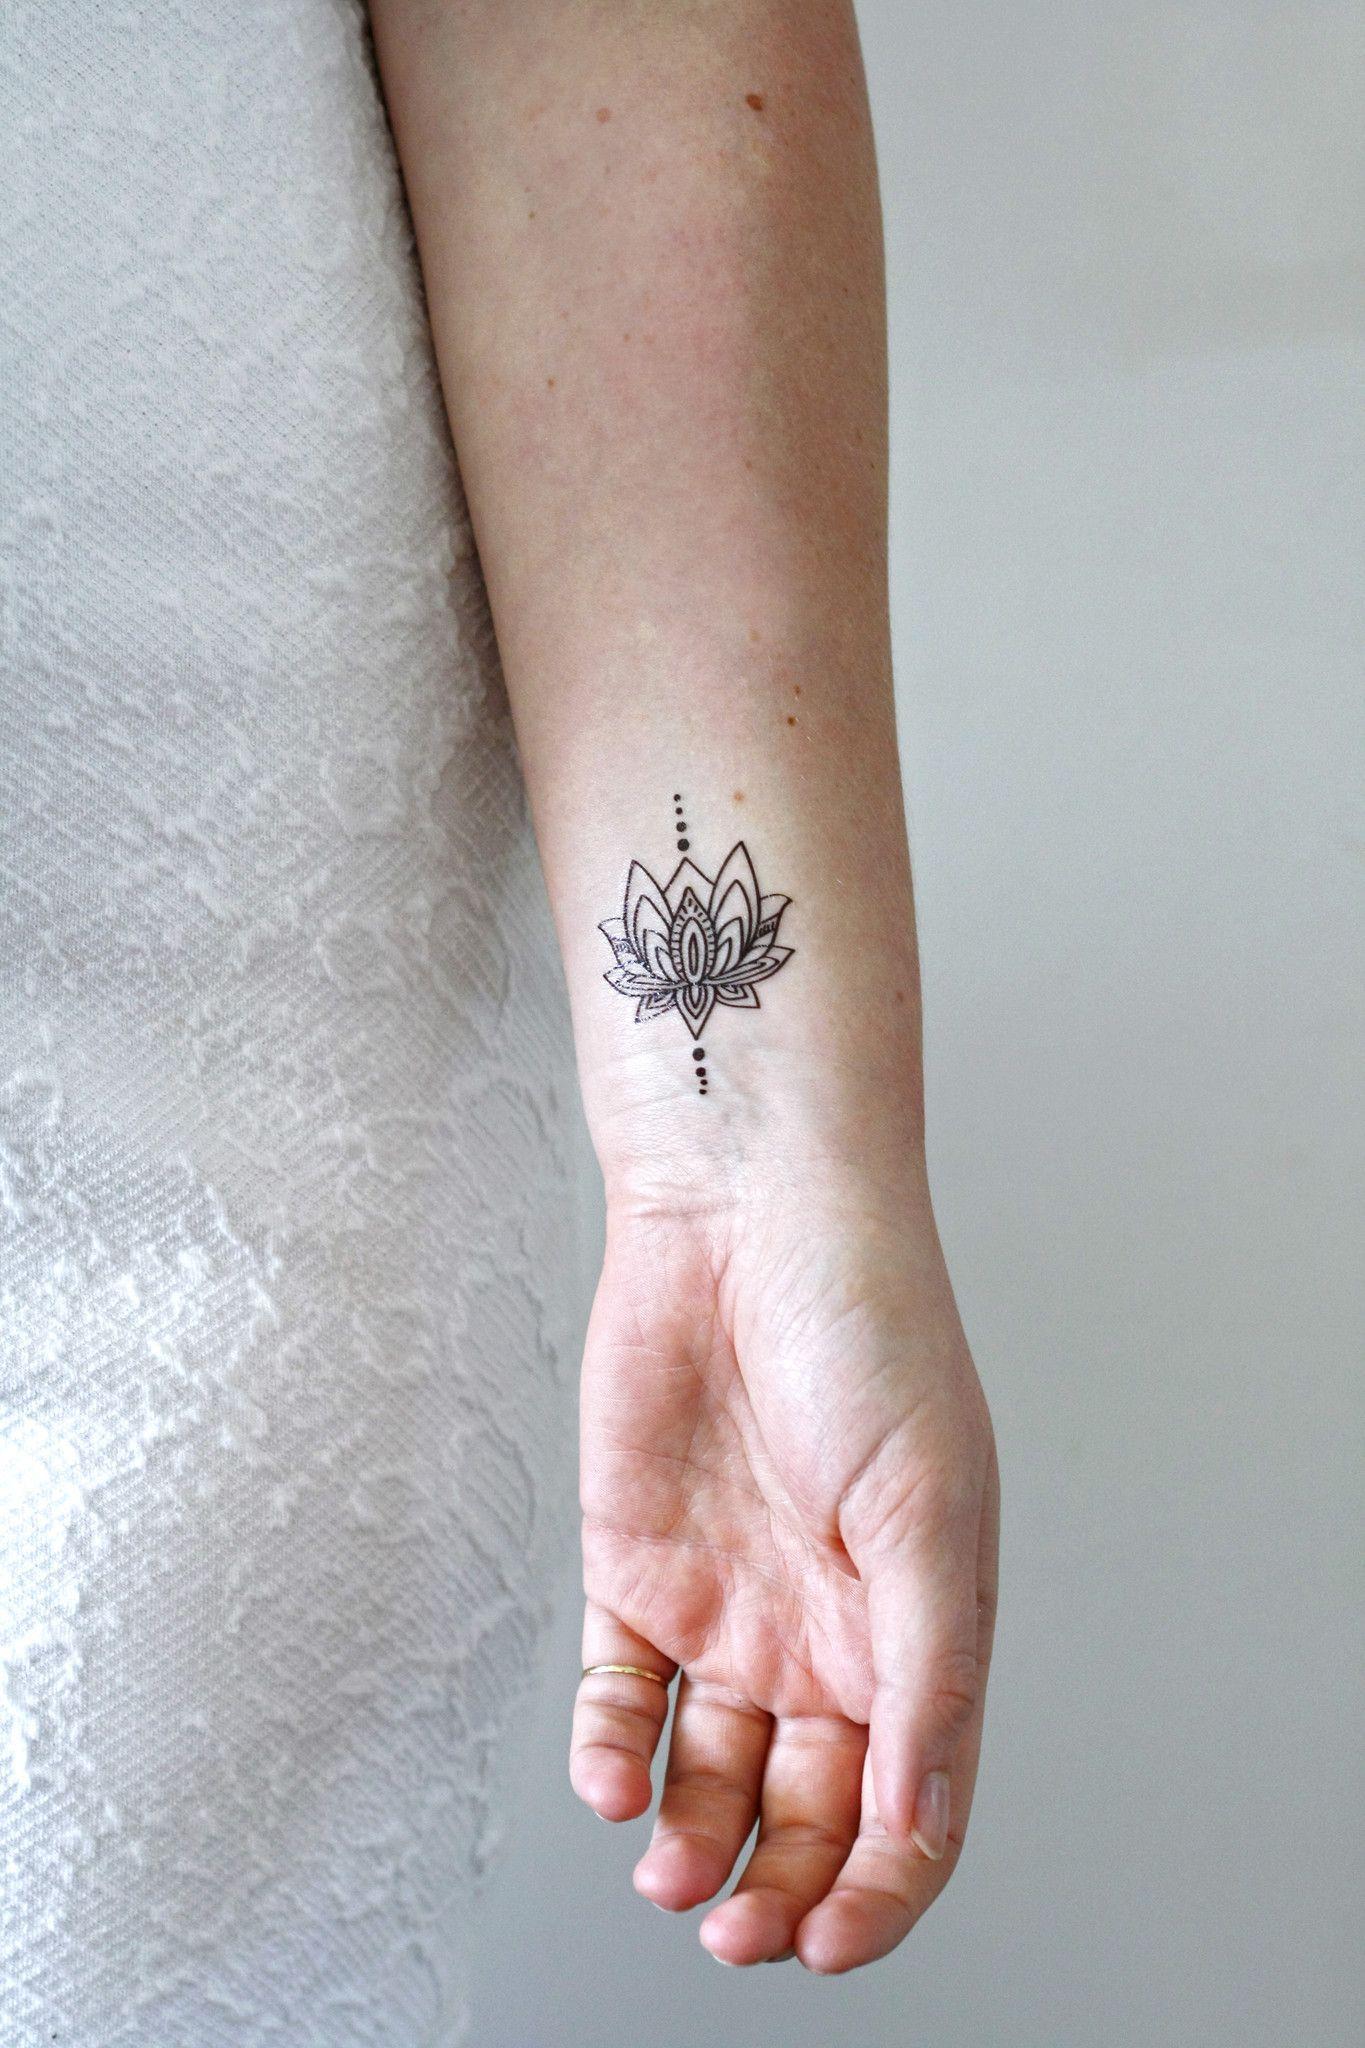 Henna Tattoos On Wrist Small Flower: Small Lotus Temporary Tattoo